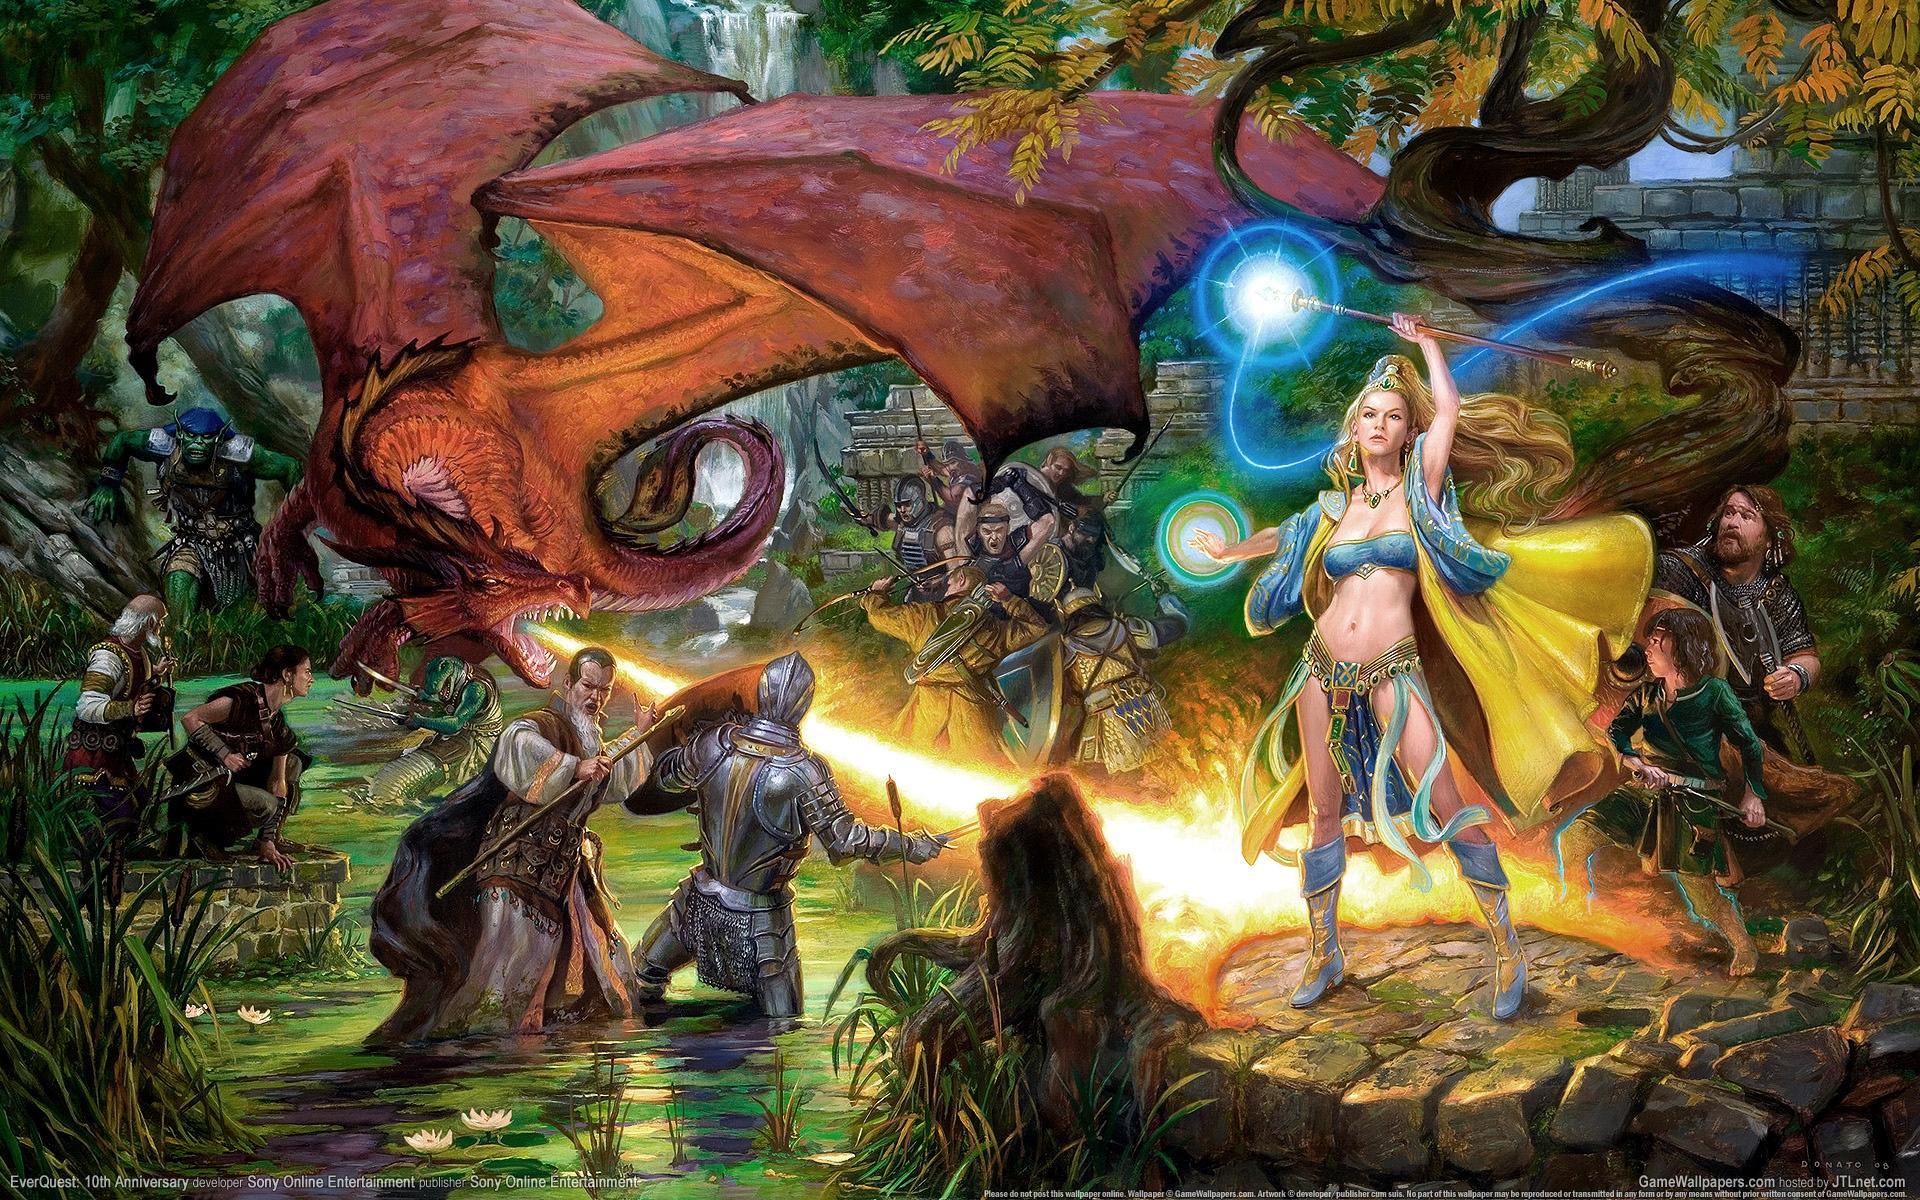 Обои игры игра Games Pubg Playerunknowns картинки на: EverQuest: 10th Anniversary, Game, Pc Games, игра, видео